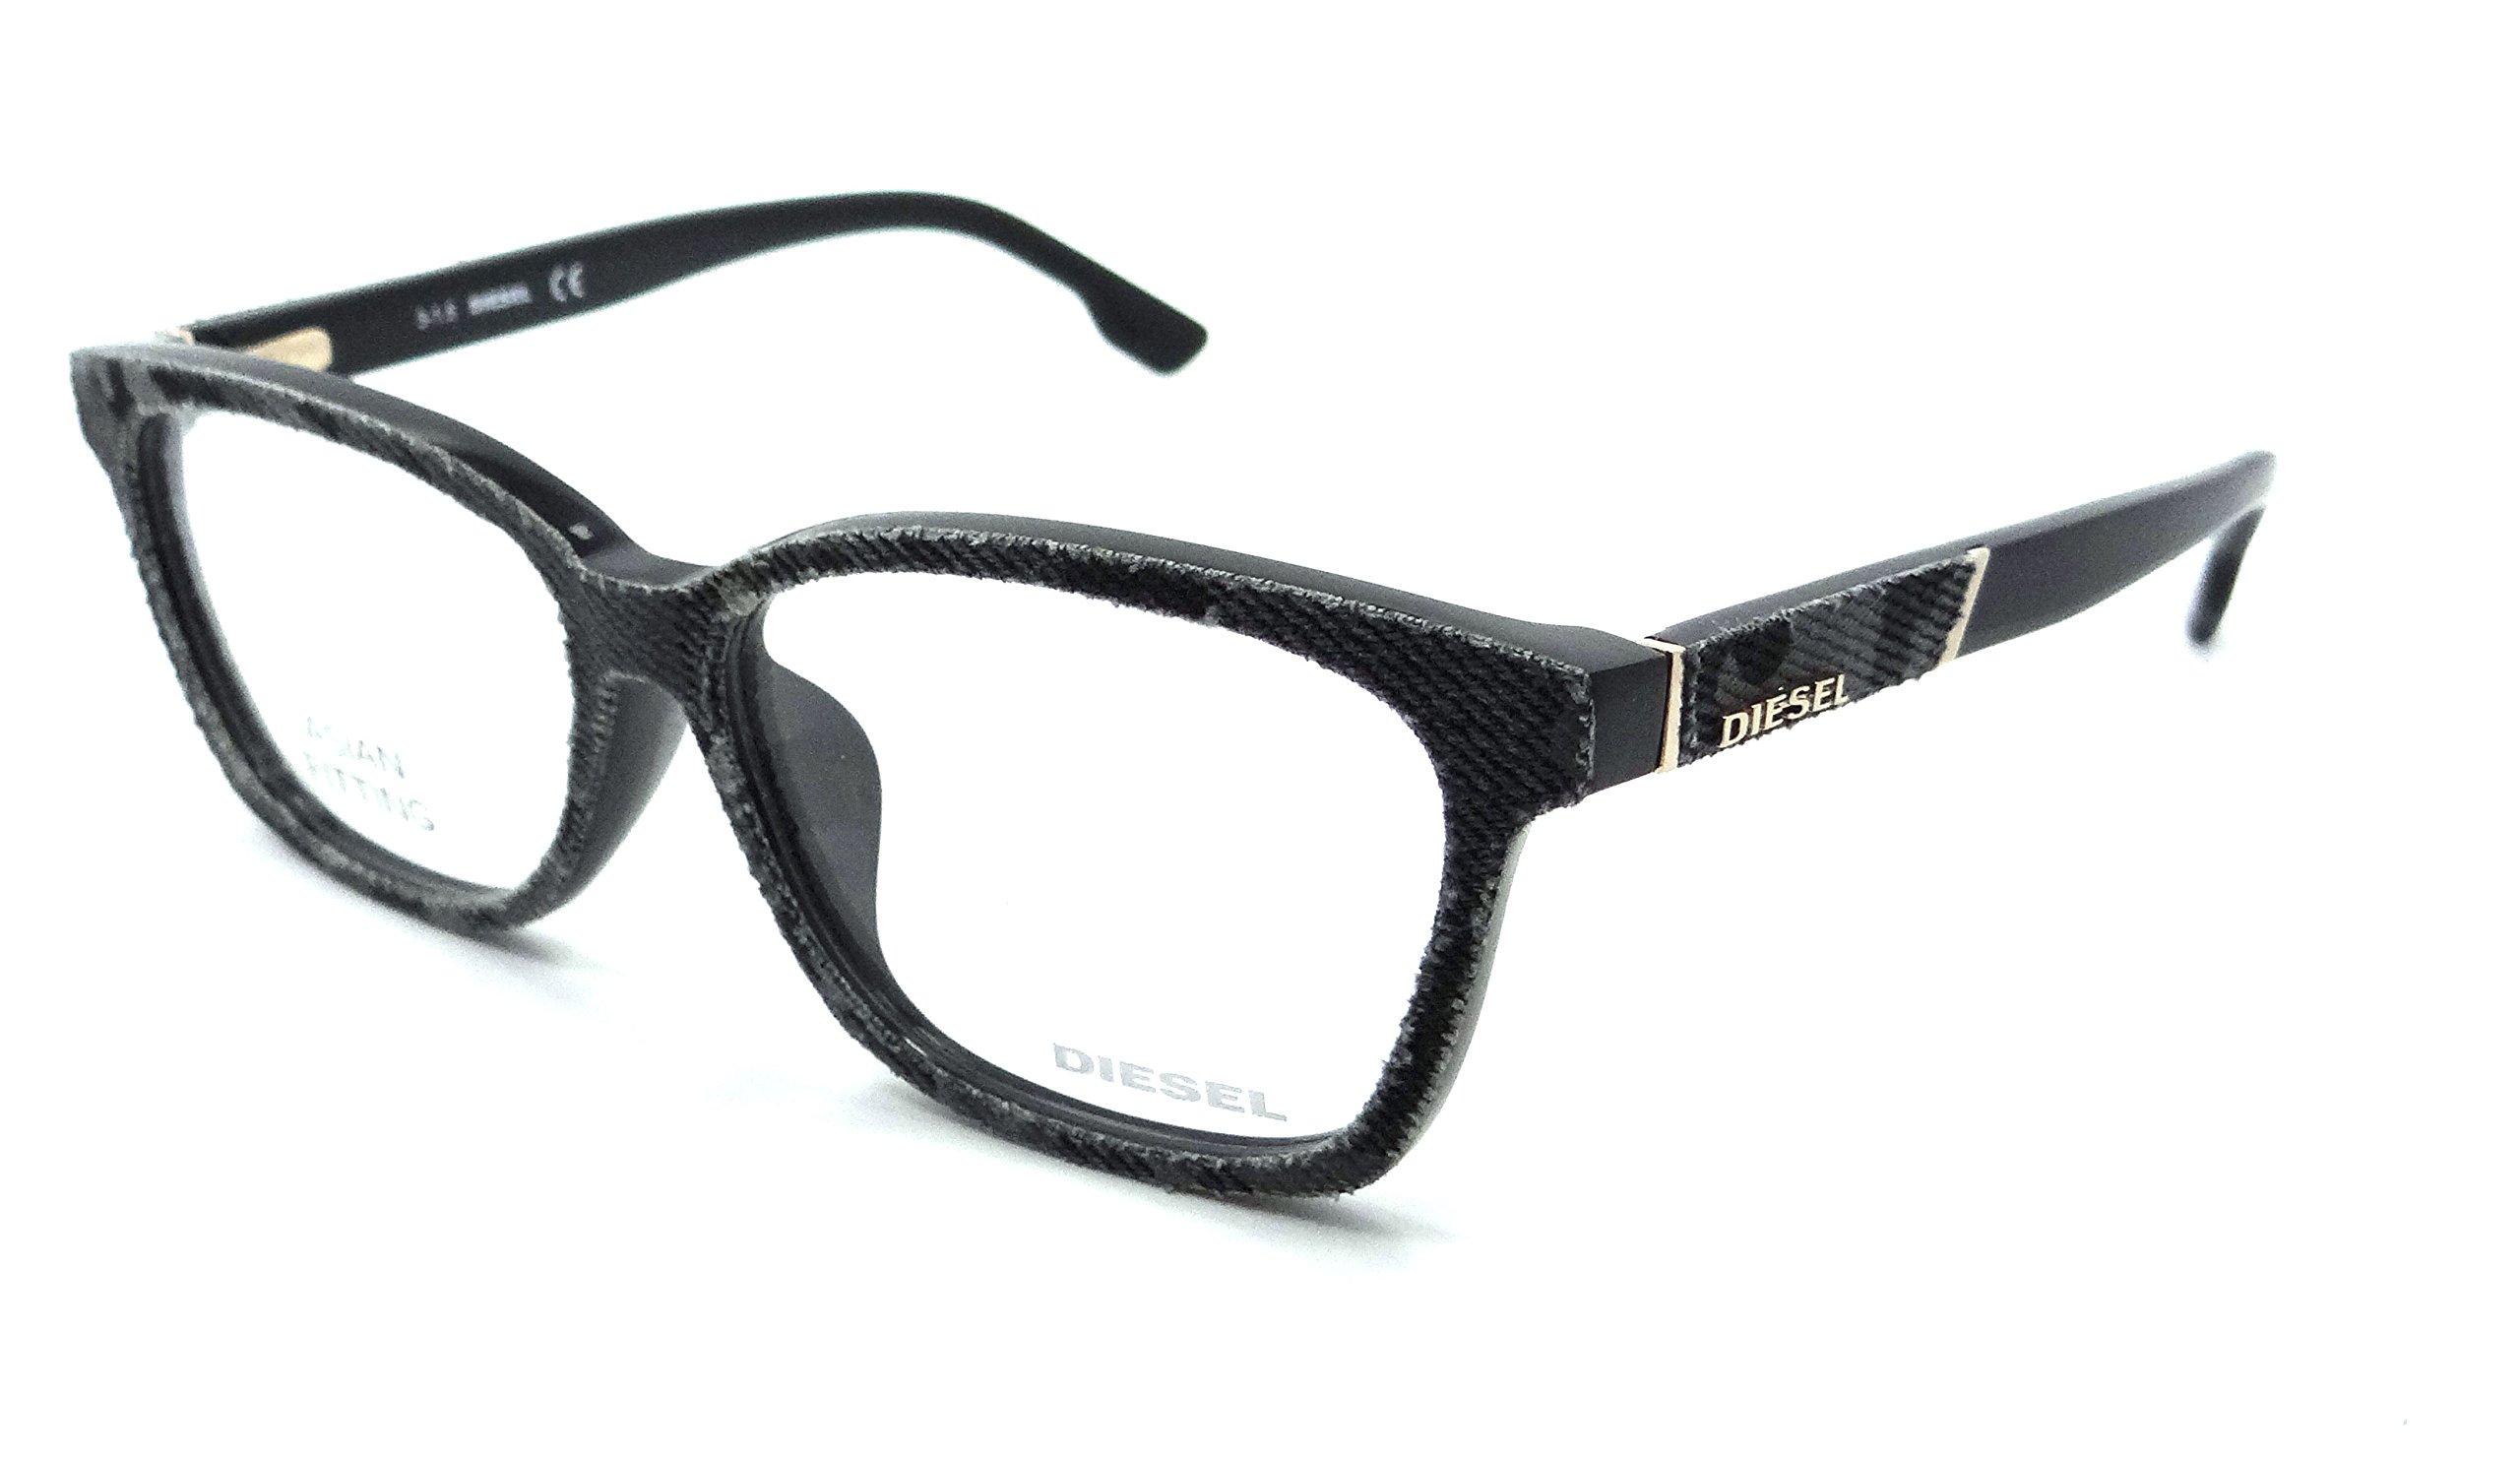 Diesel Rx Eyeglasses Frames DL5137-F 020 58-14-145 Grey Black Denim Asian Fit